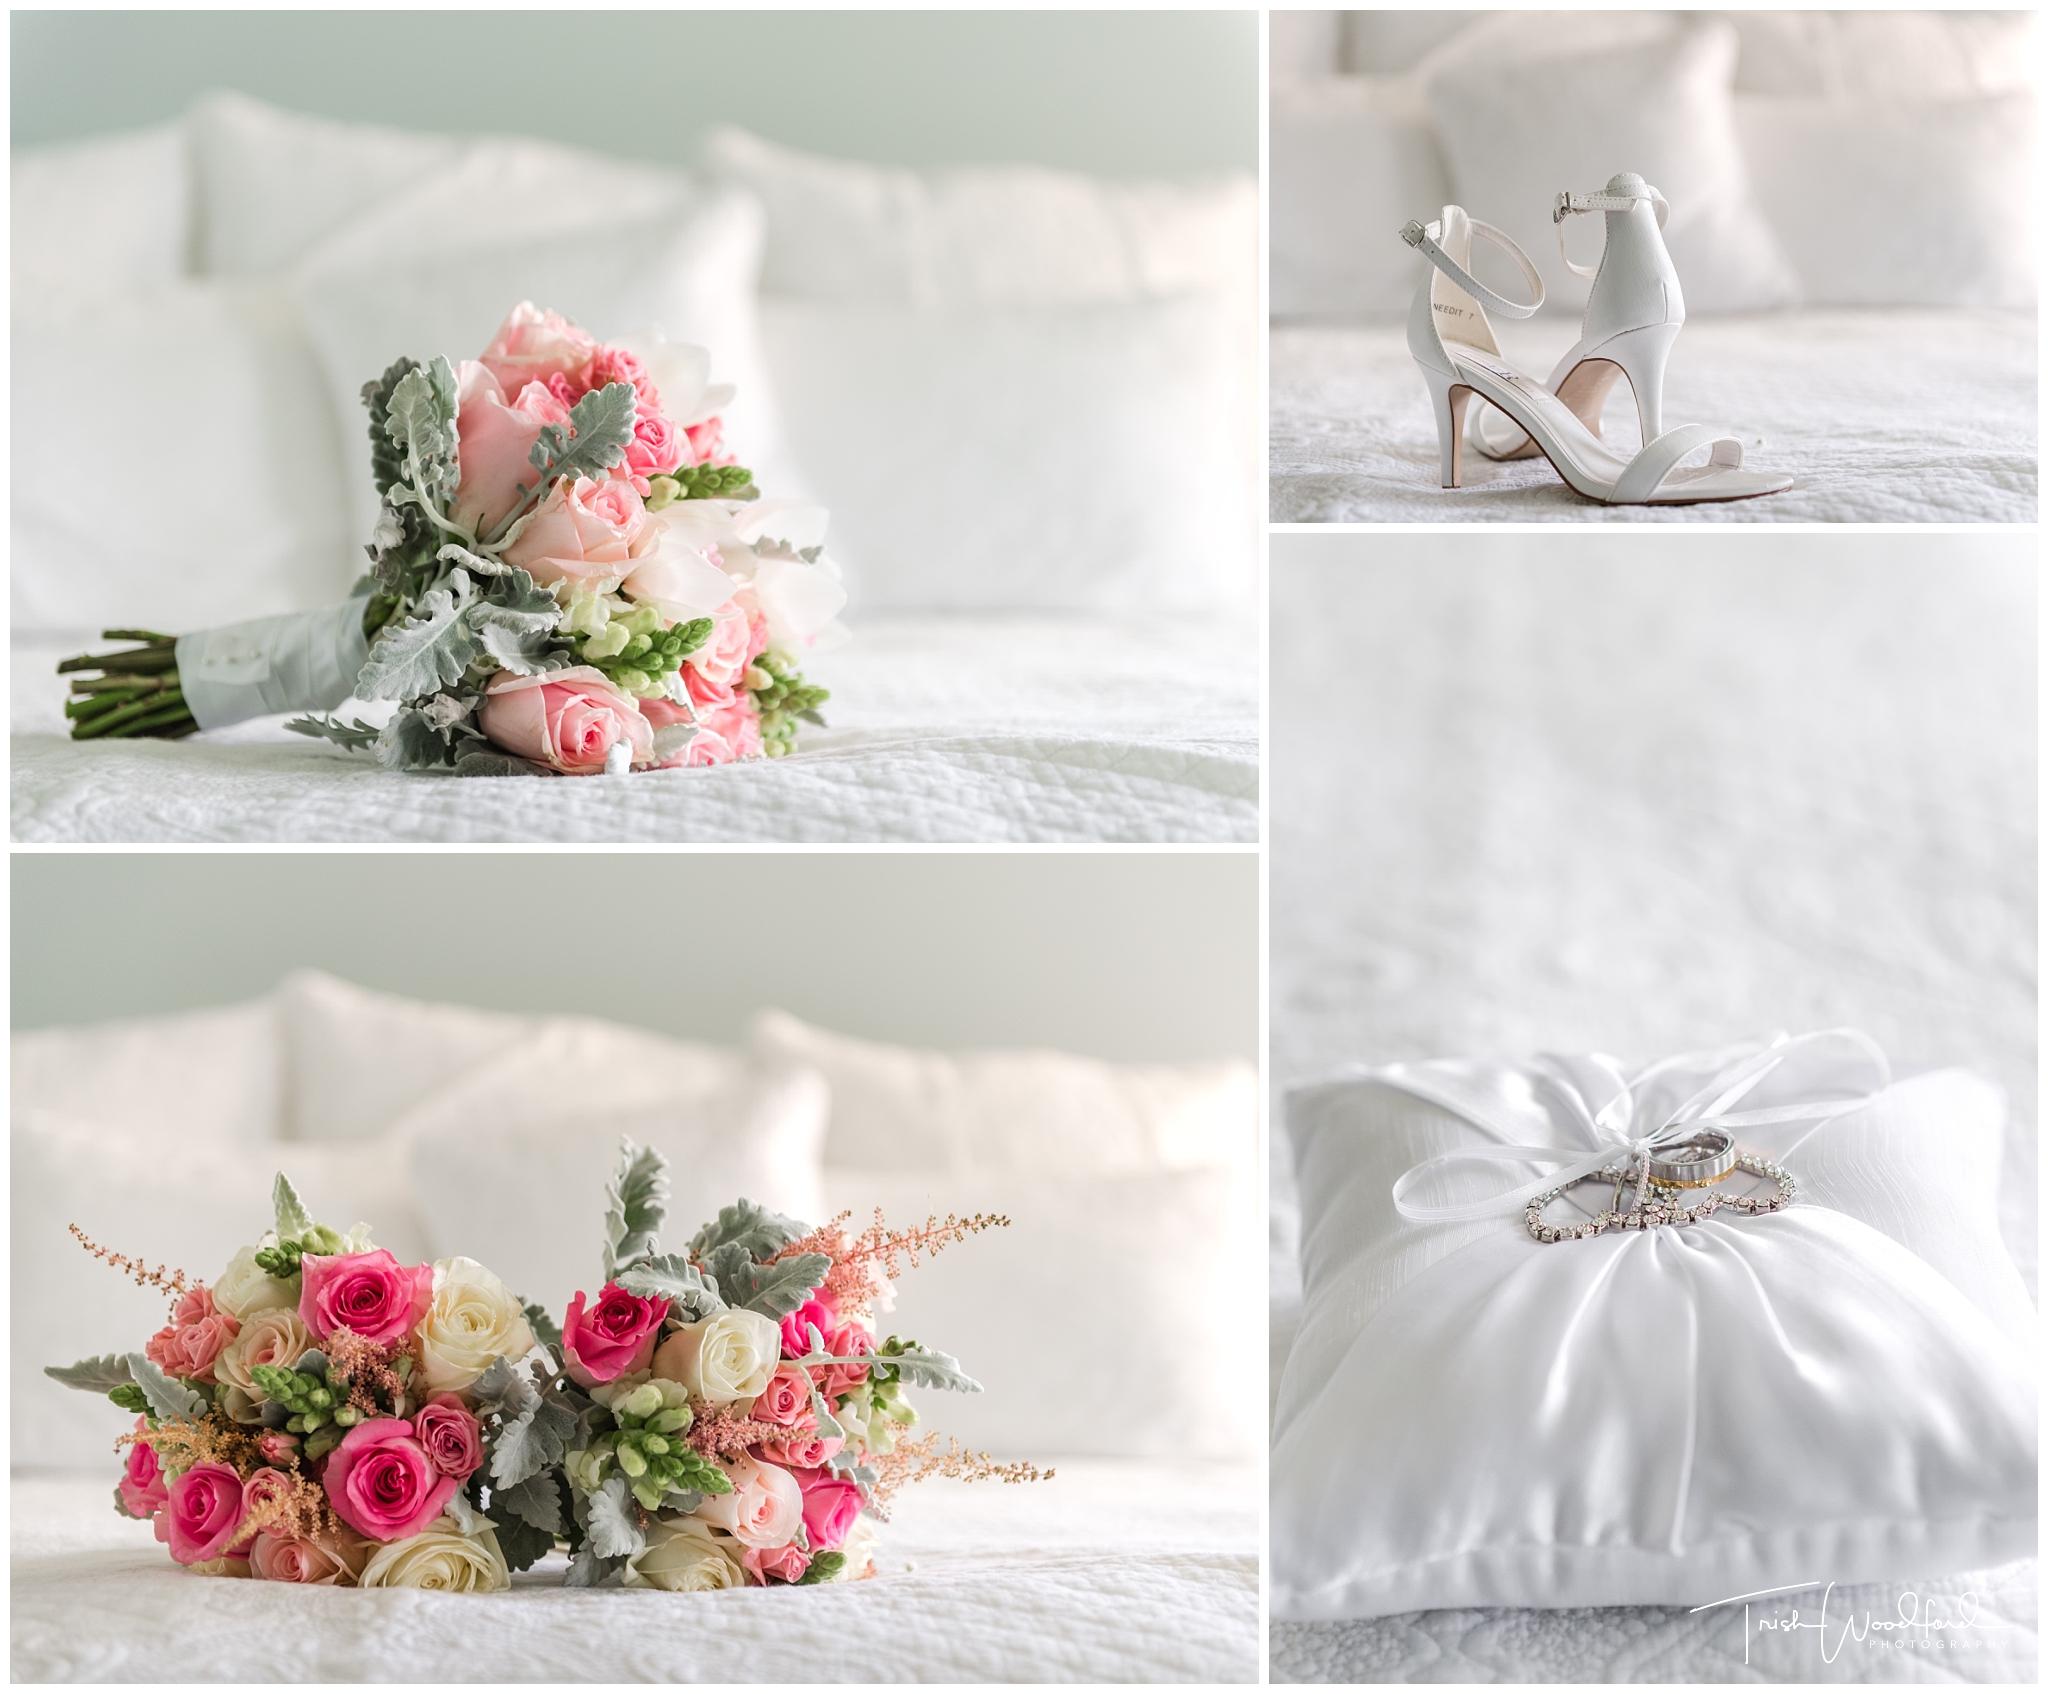 Peel Manor House Wedding Details